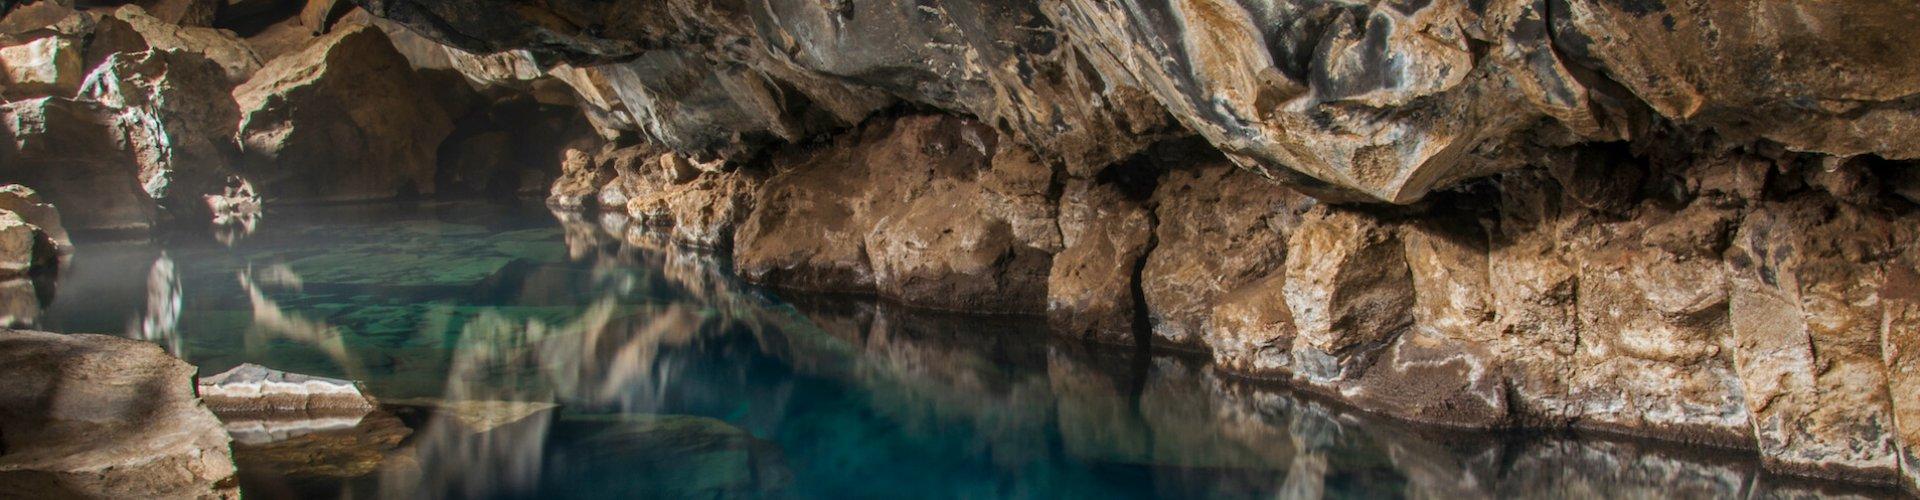 Ausflugsziel Cueva de los Verdes